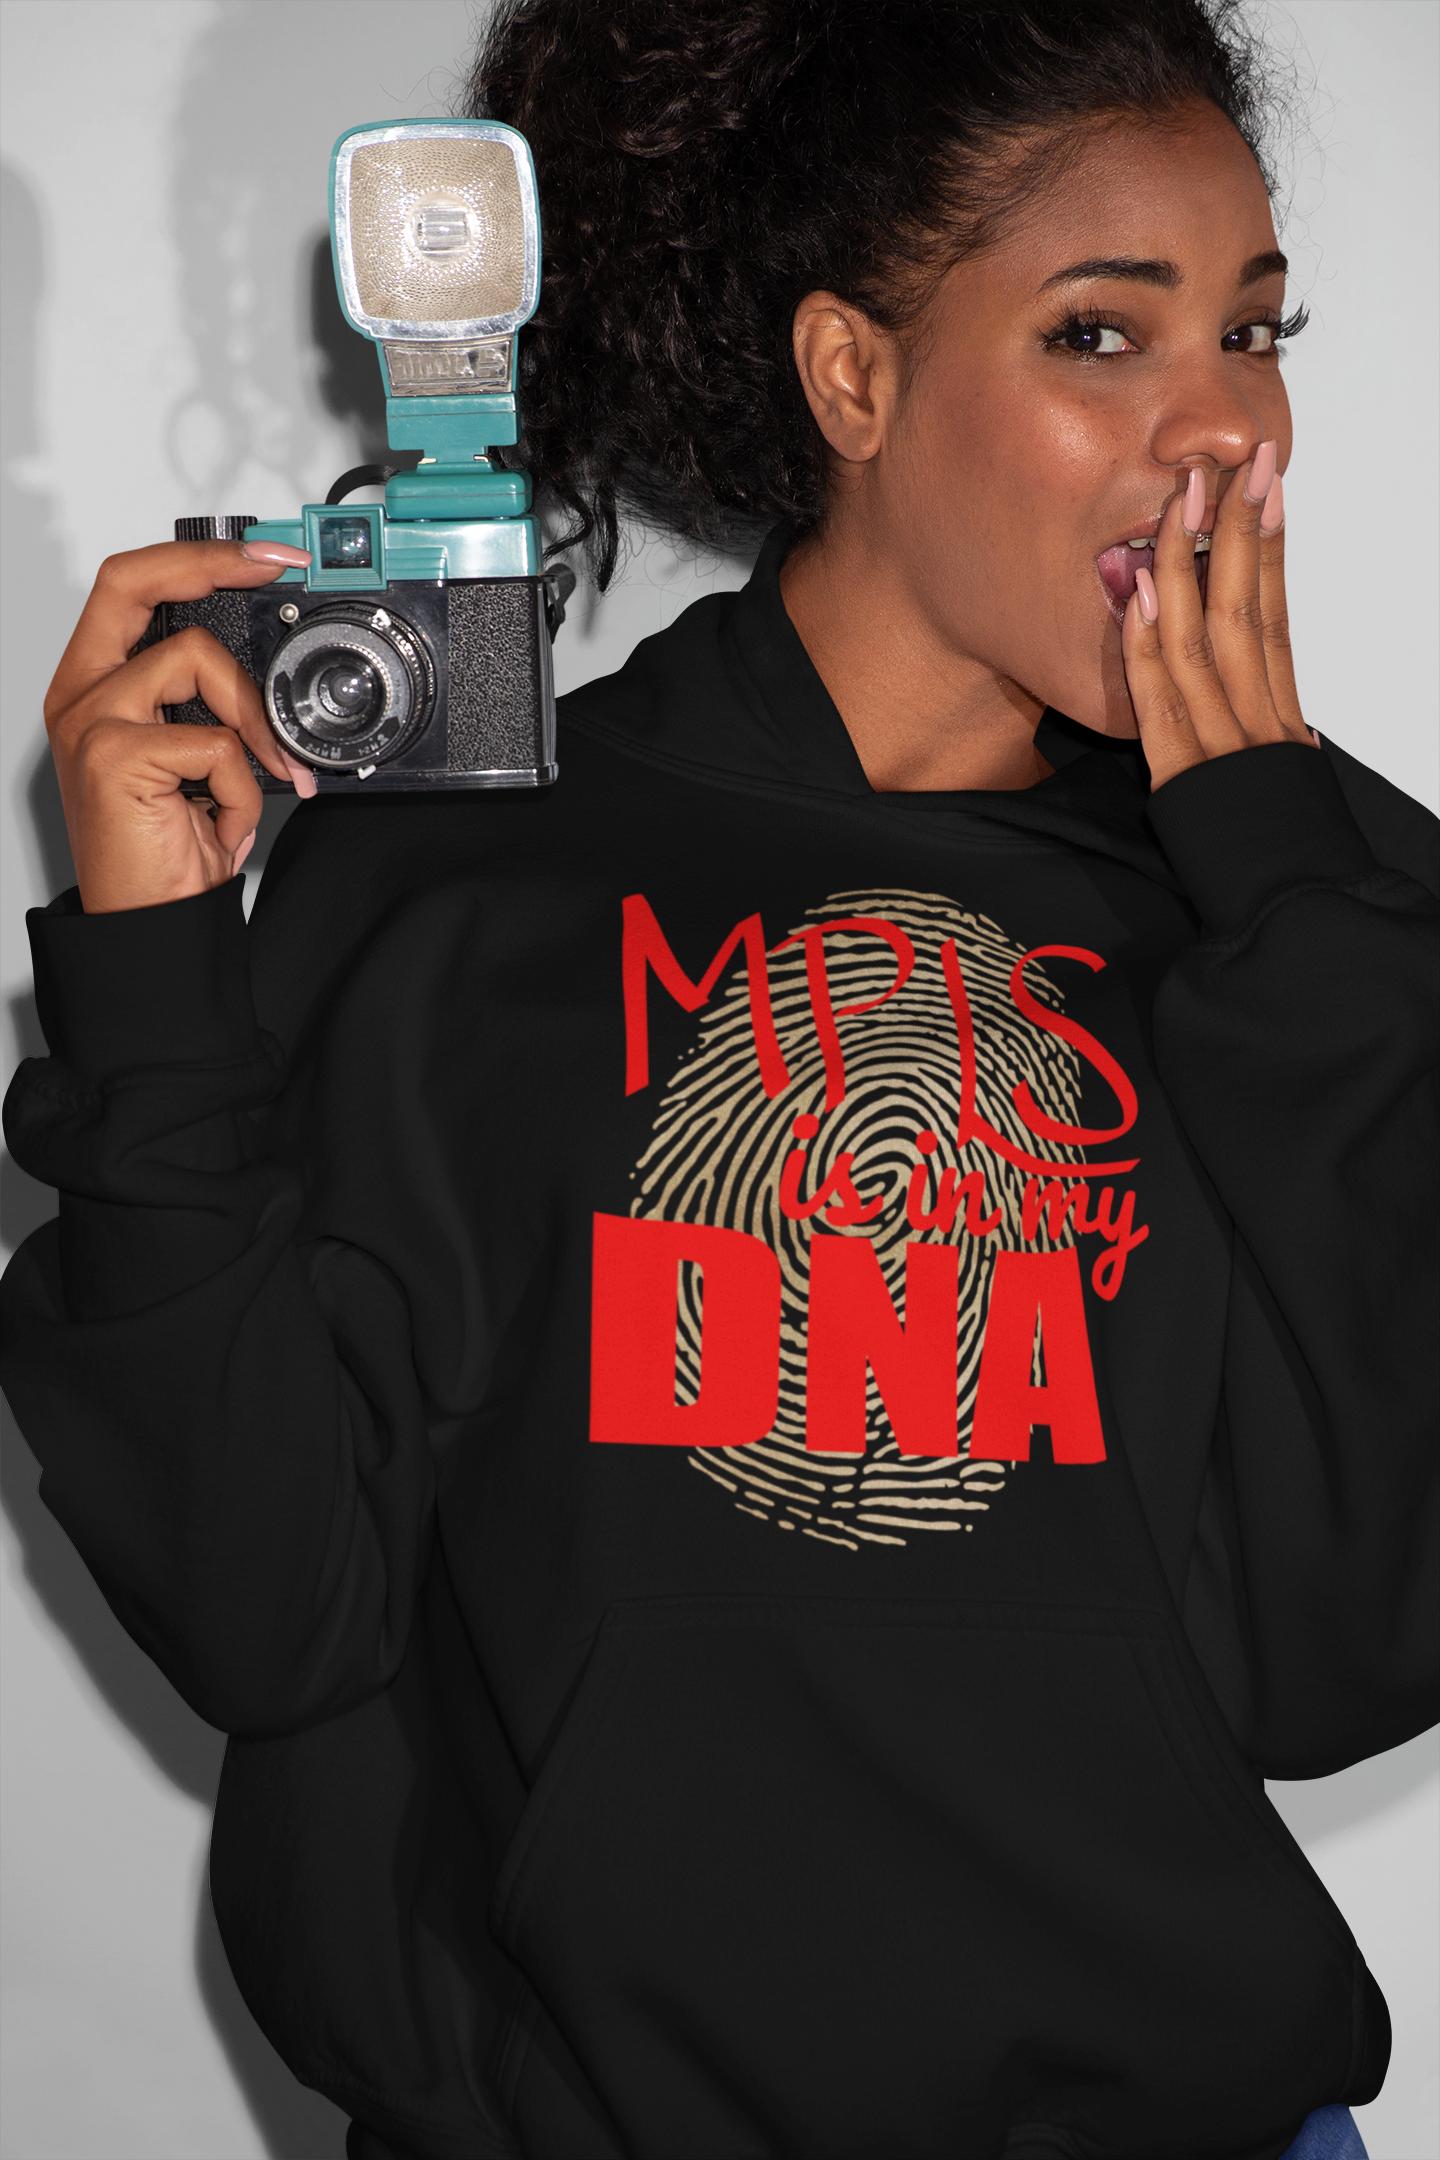 hoodie-mockup-featuring-a-girl-posing-wi